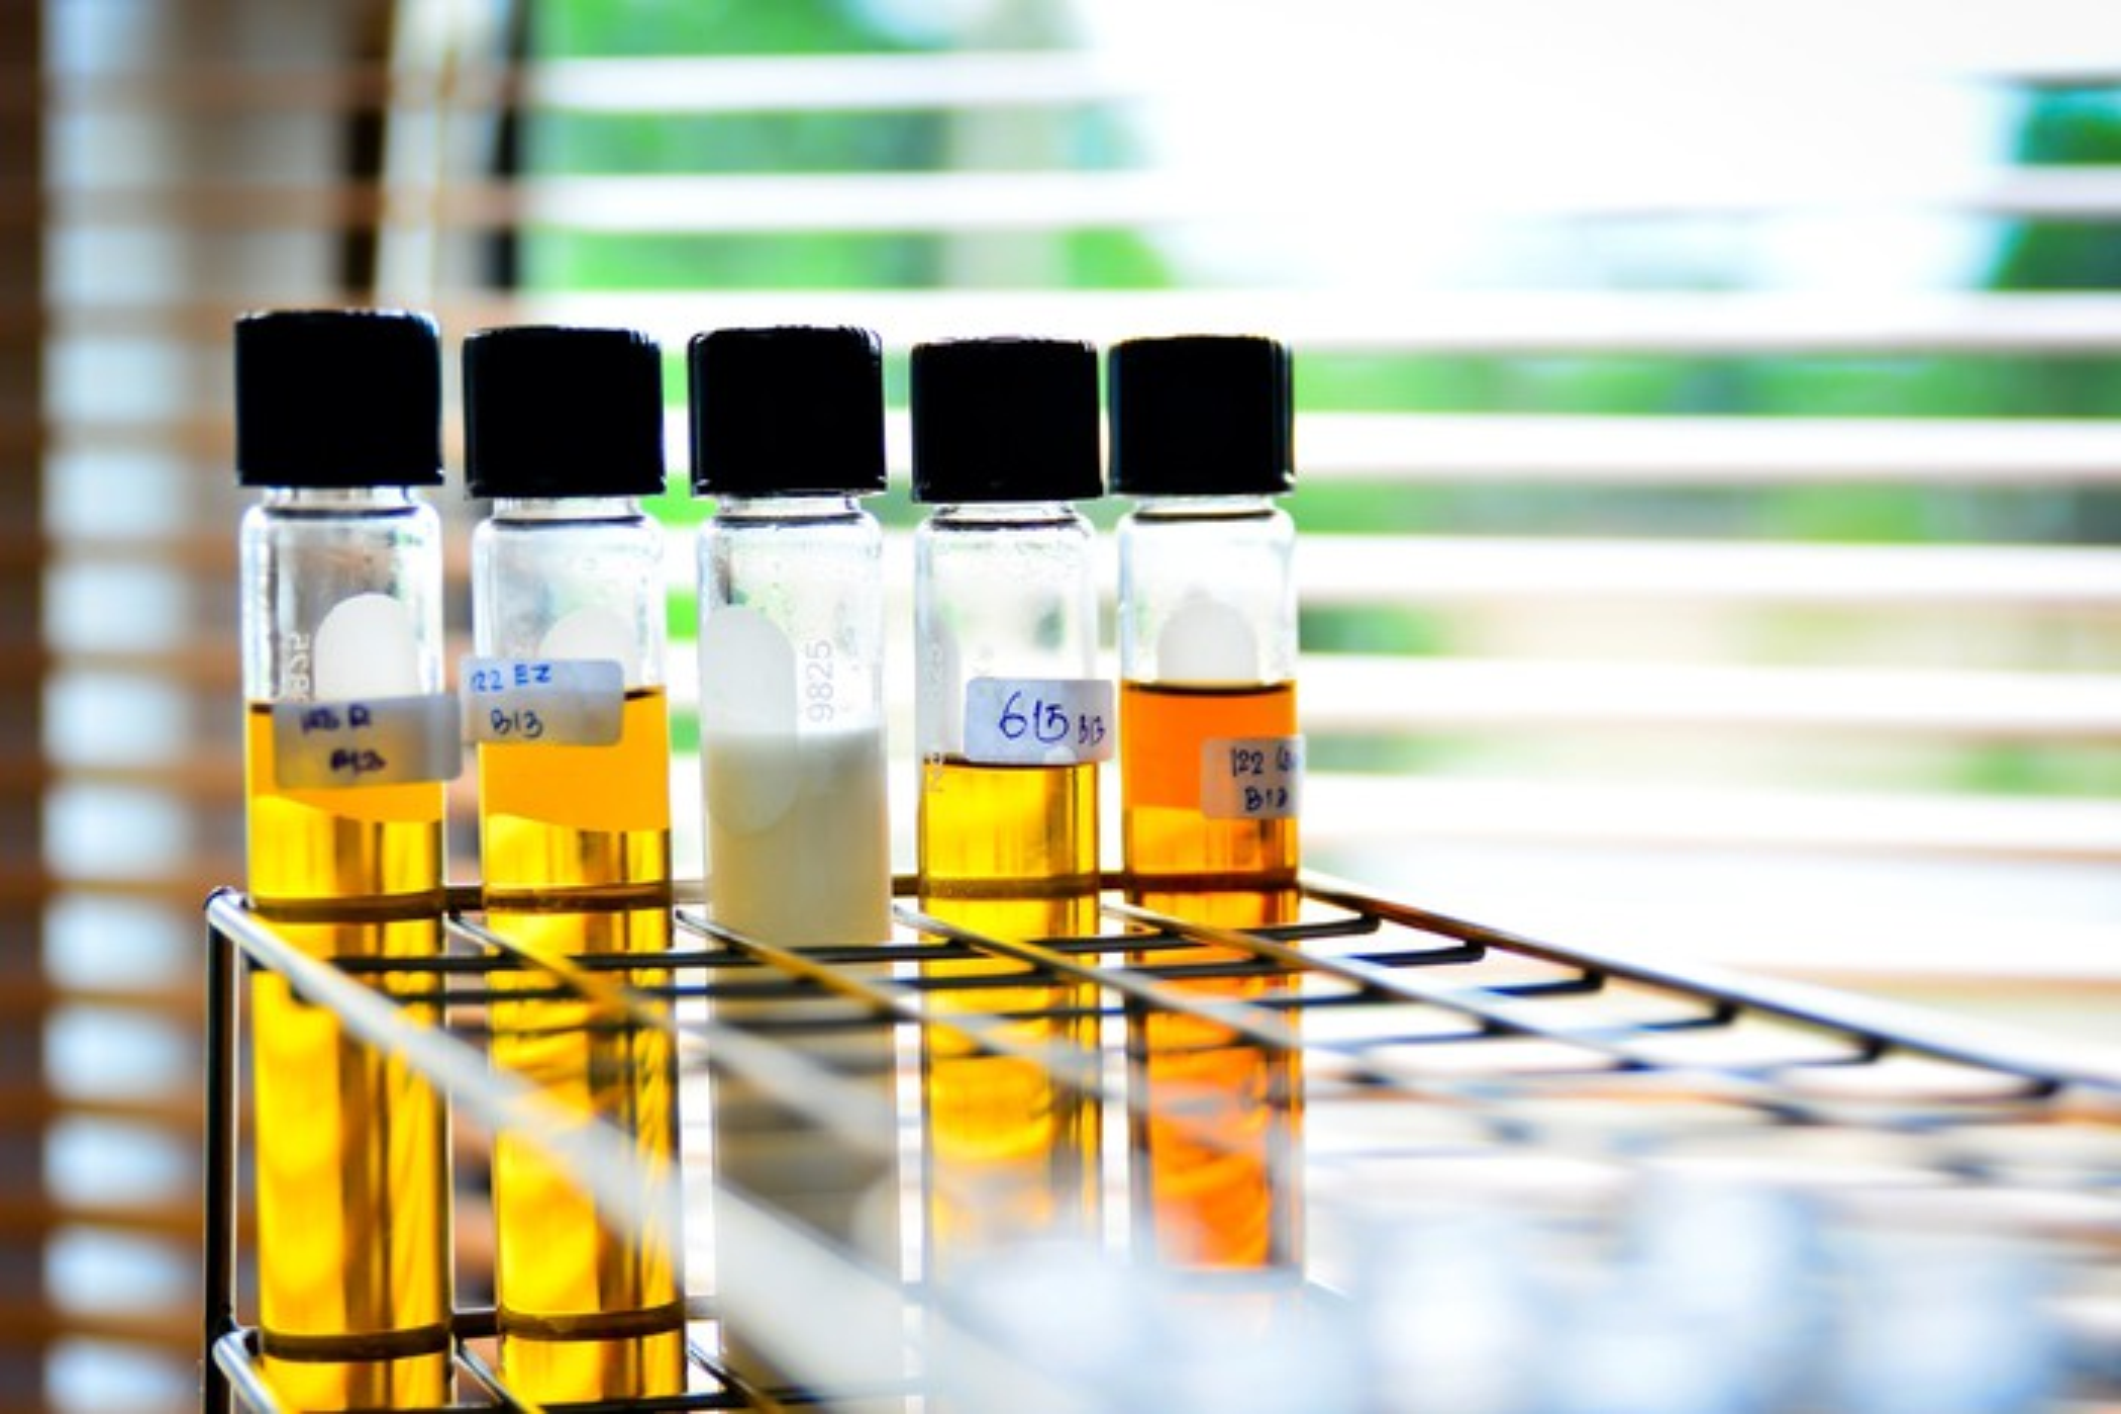 Test tubes on a laboratory desk